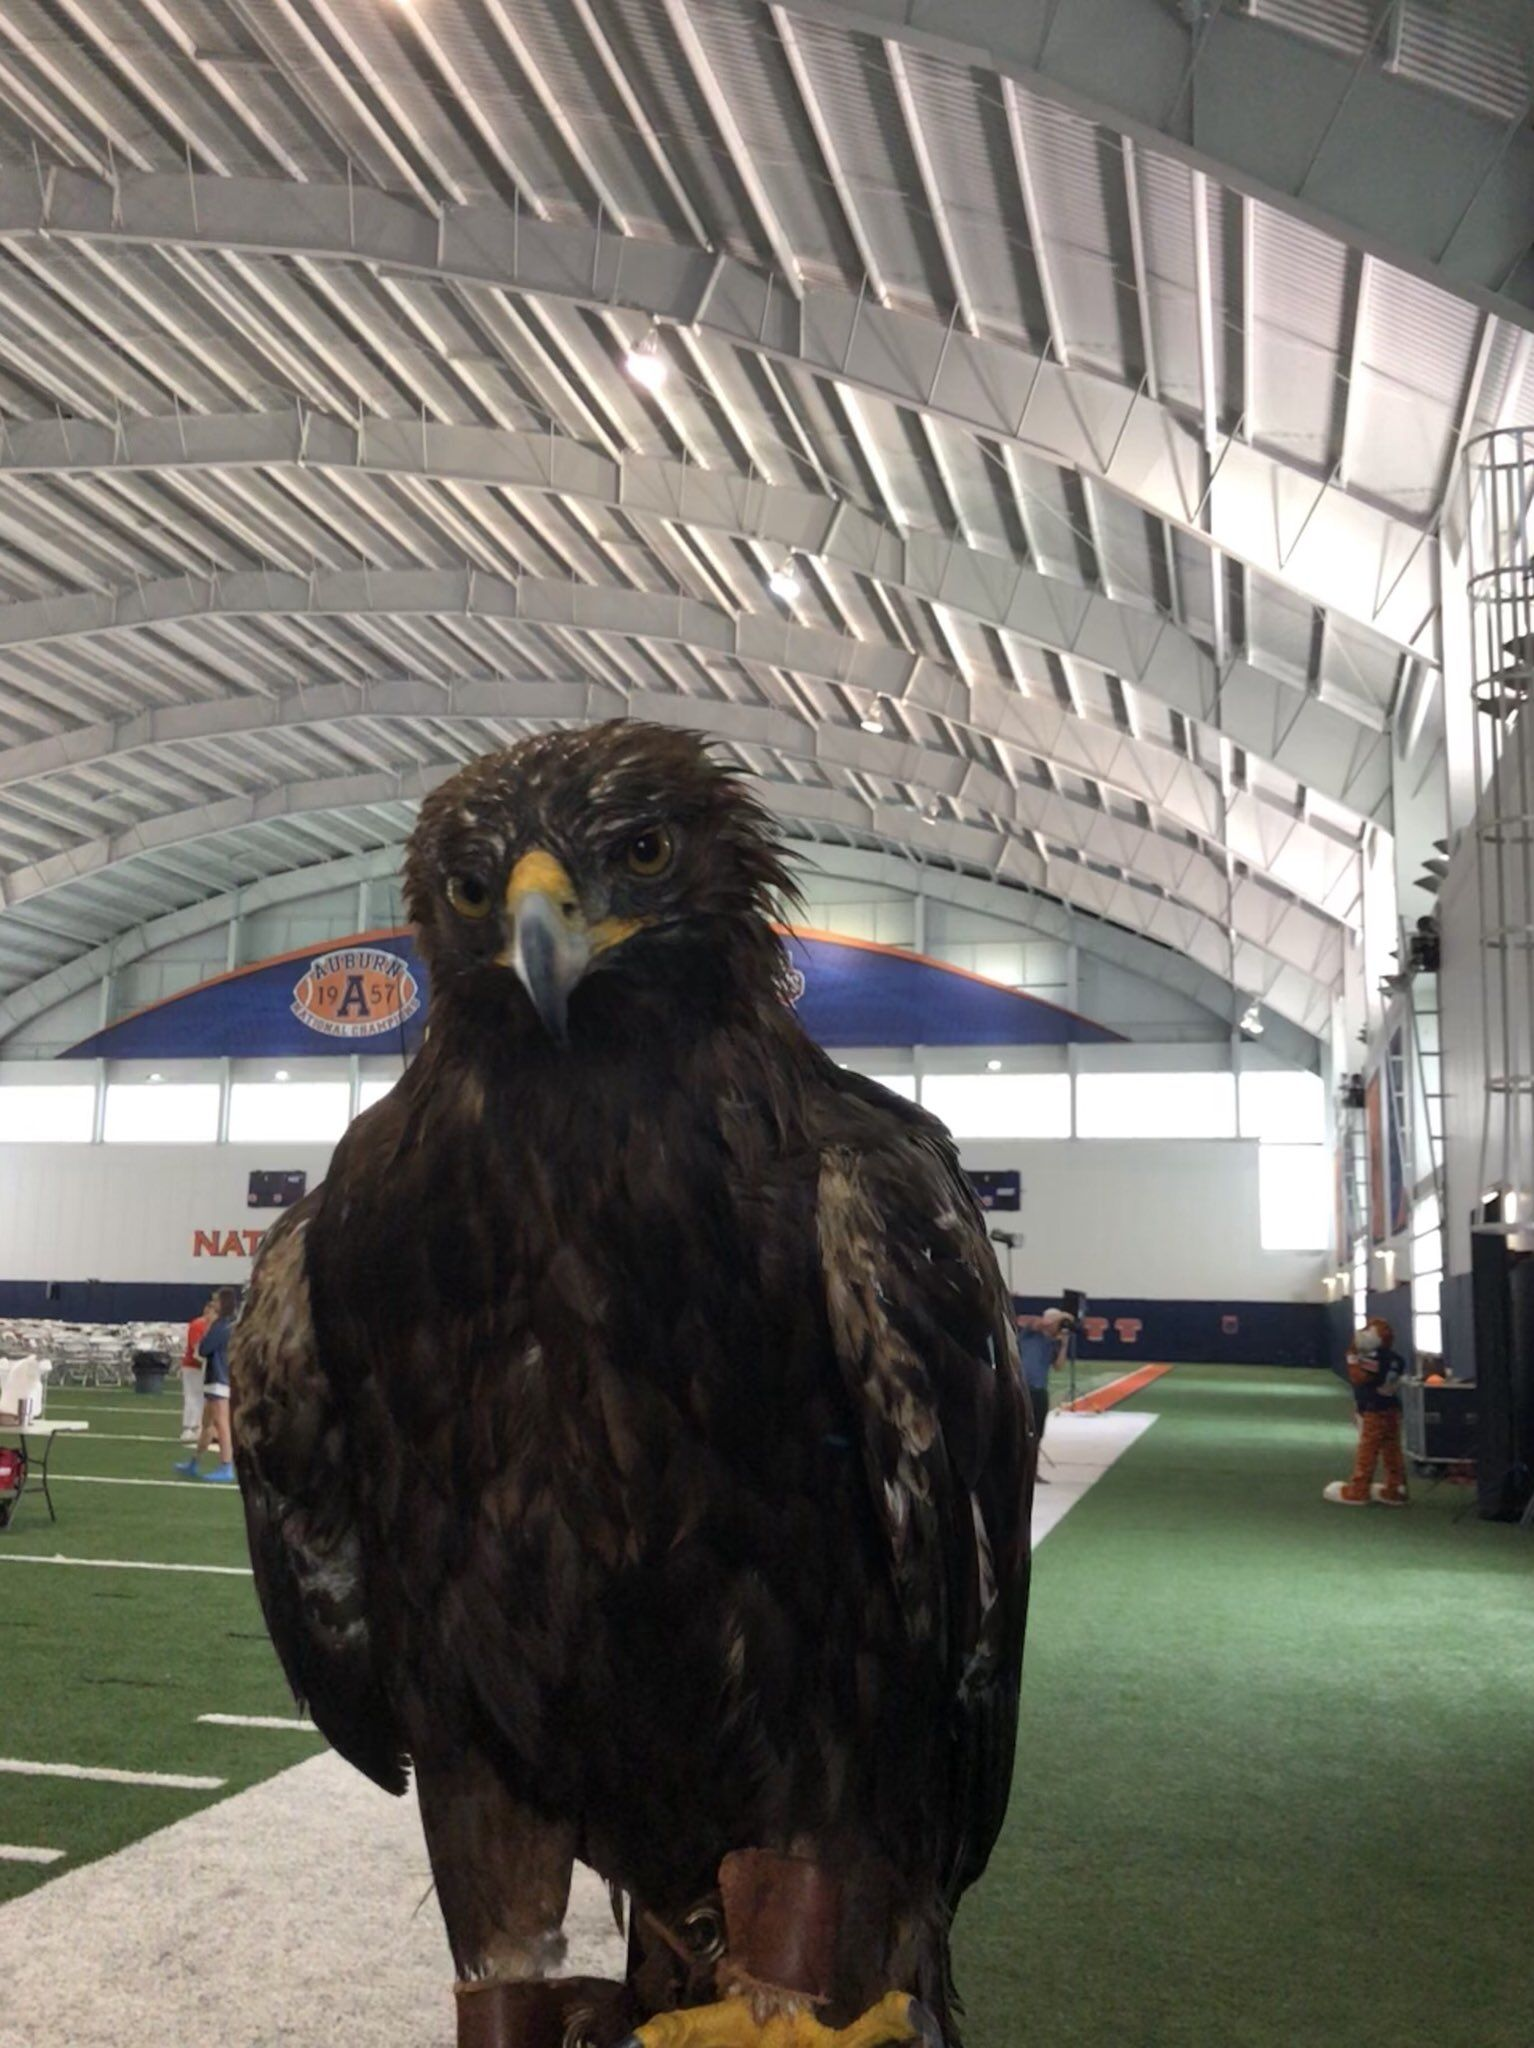 War Eagle Vii On War Eagle Pinterest Eagle And Auburn